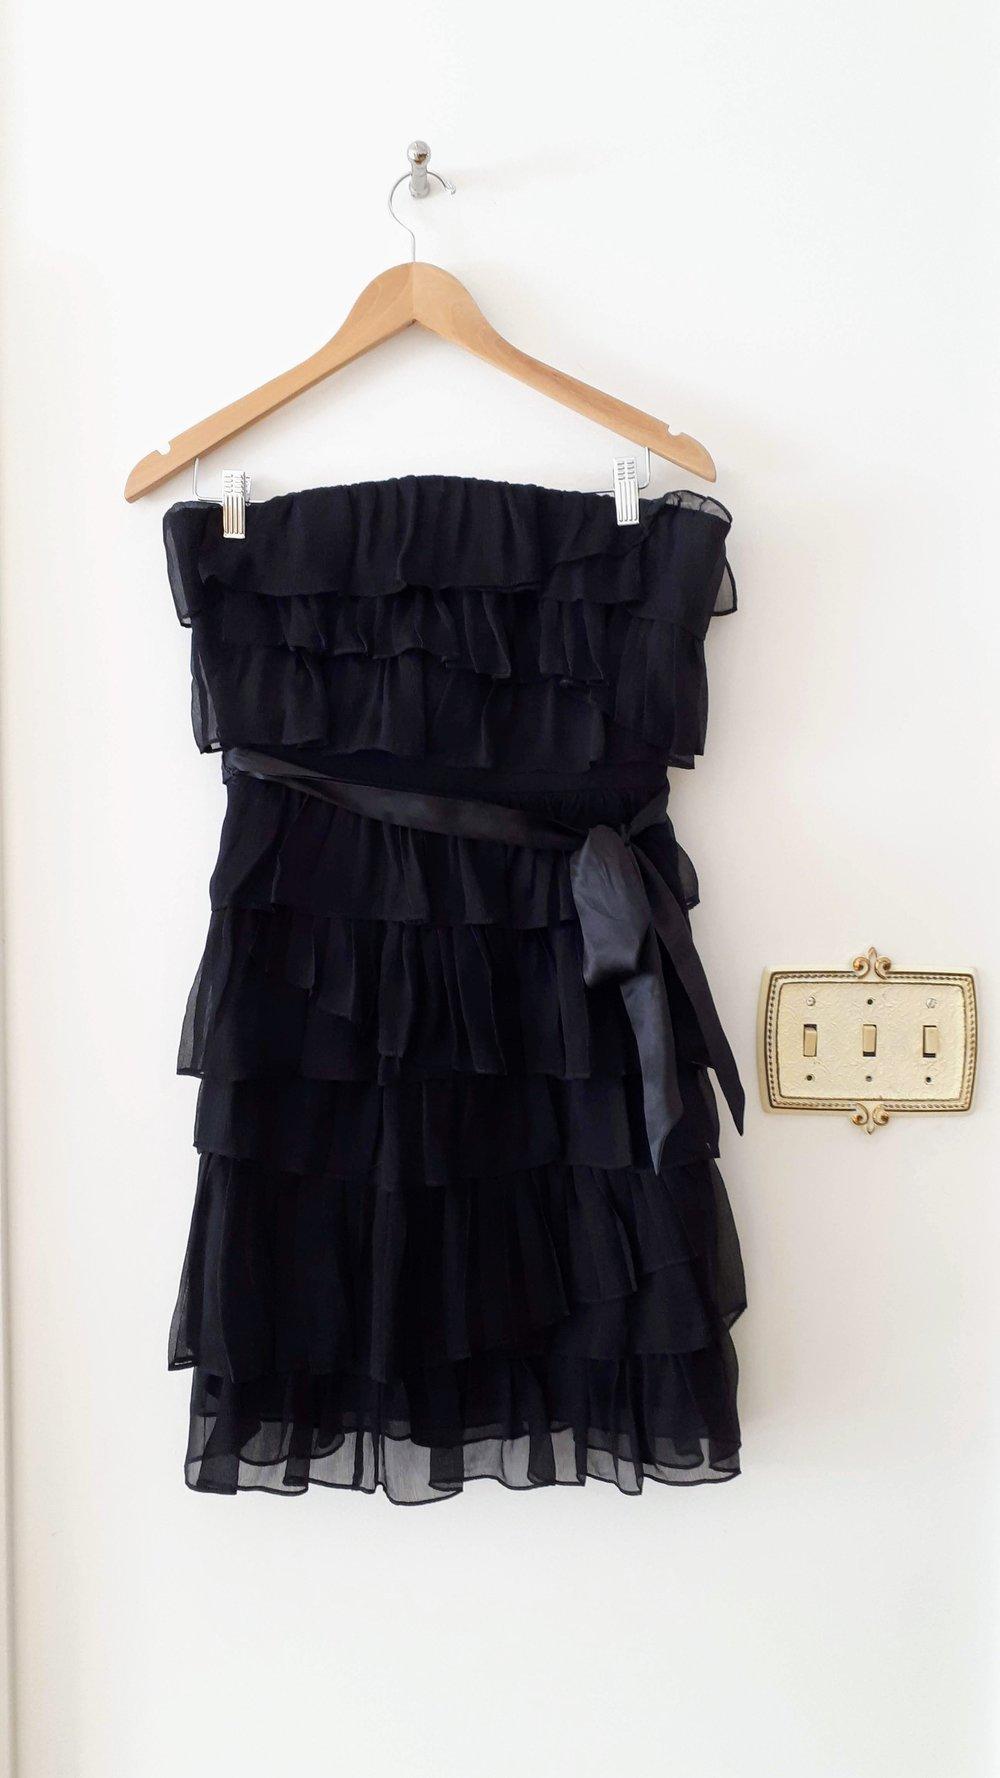 J Crew dress; Size 8, $46